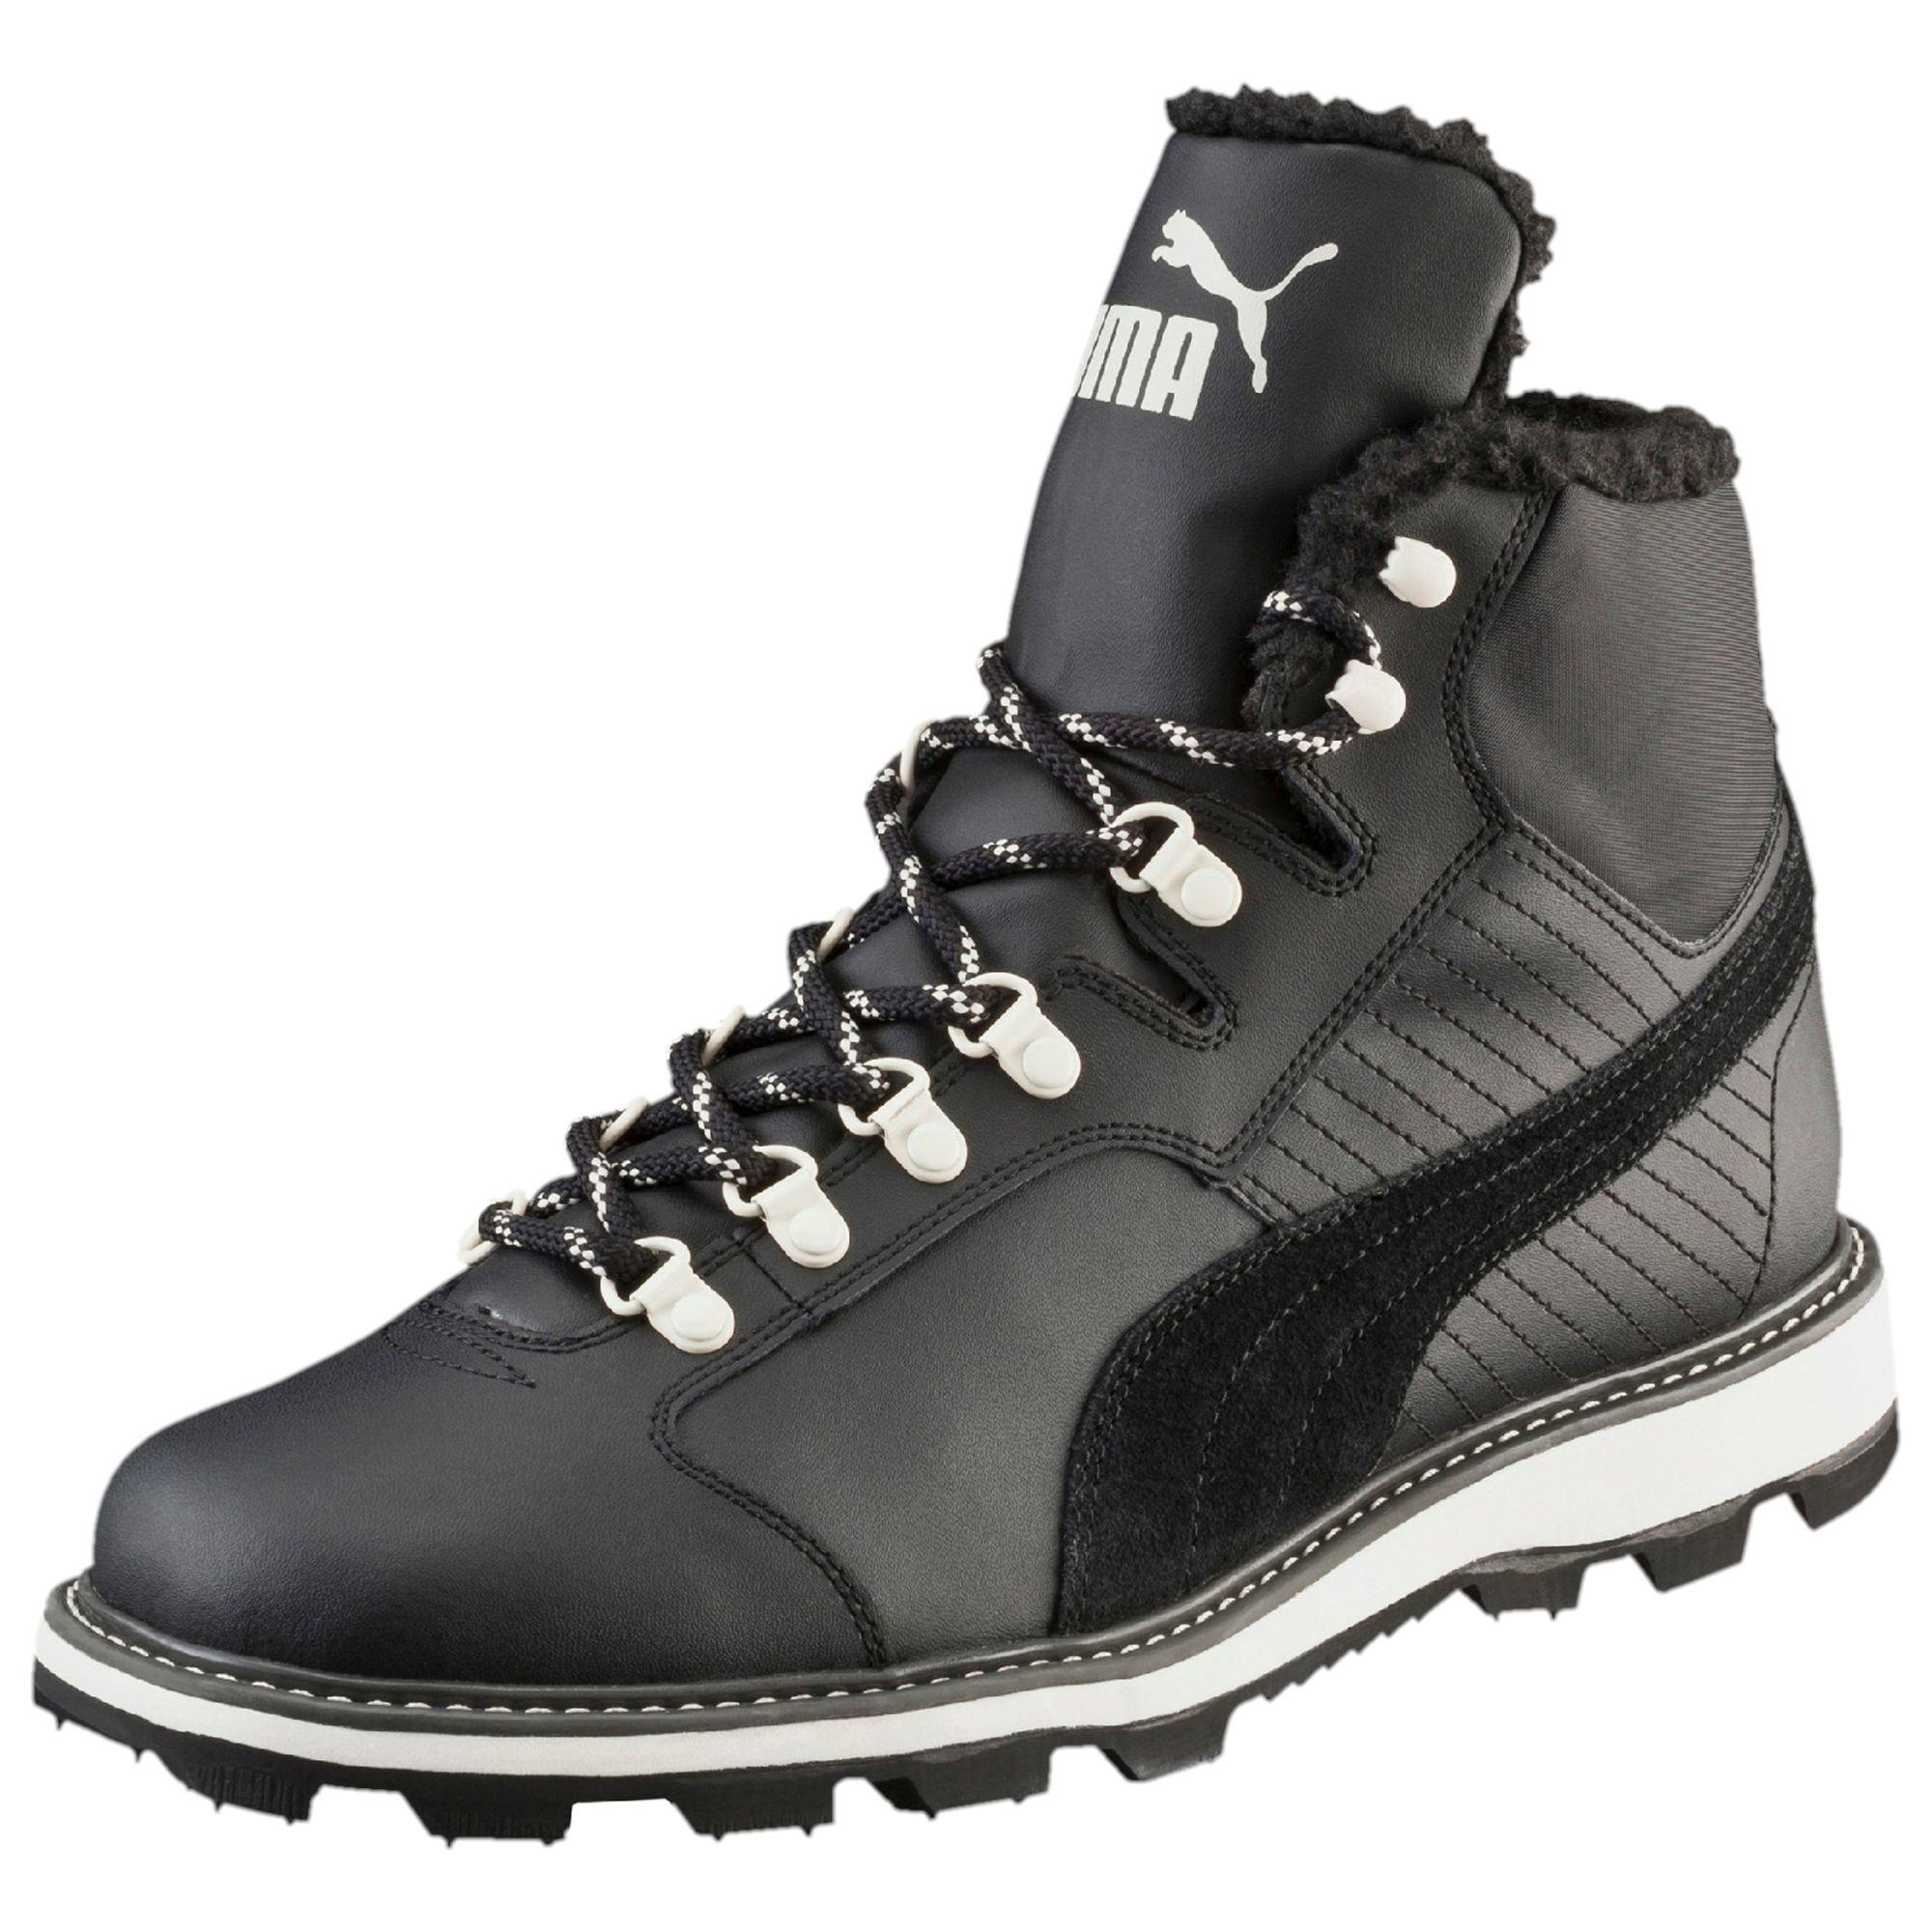 PUMA Tatau Fur Men's Boots in Black